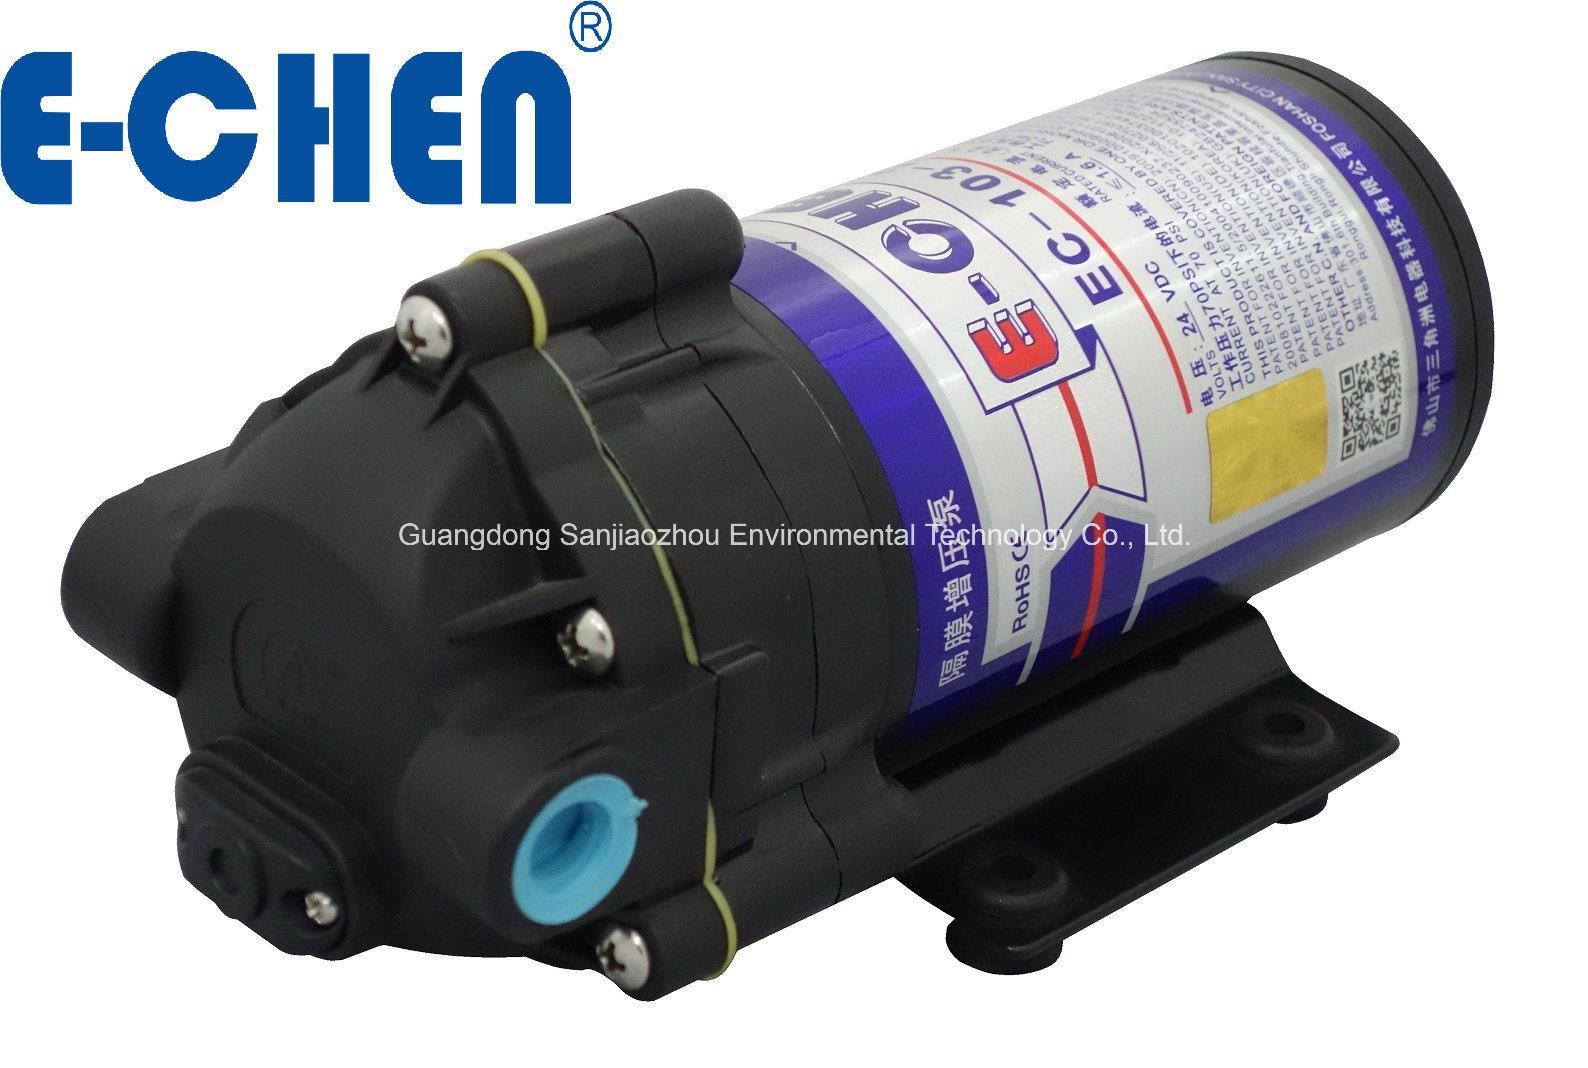 E-Chen 200gpd 103 Series Diaphragm RO Booster Pump